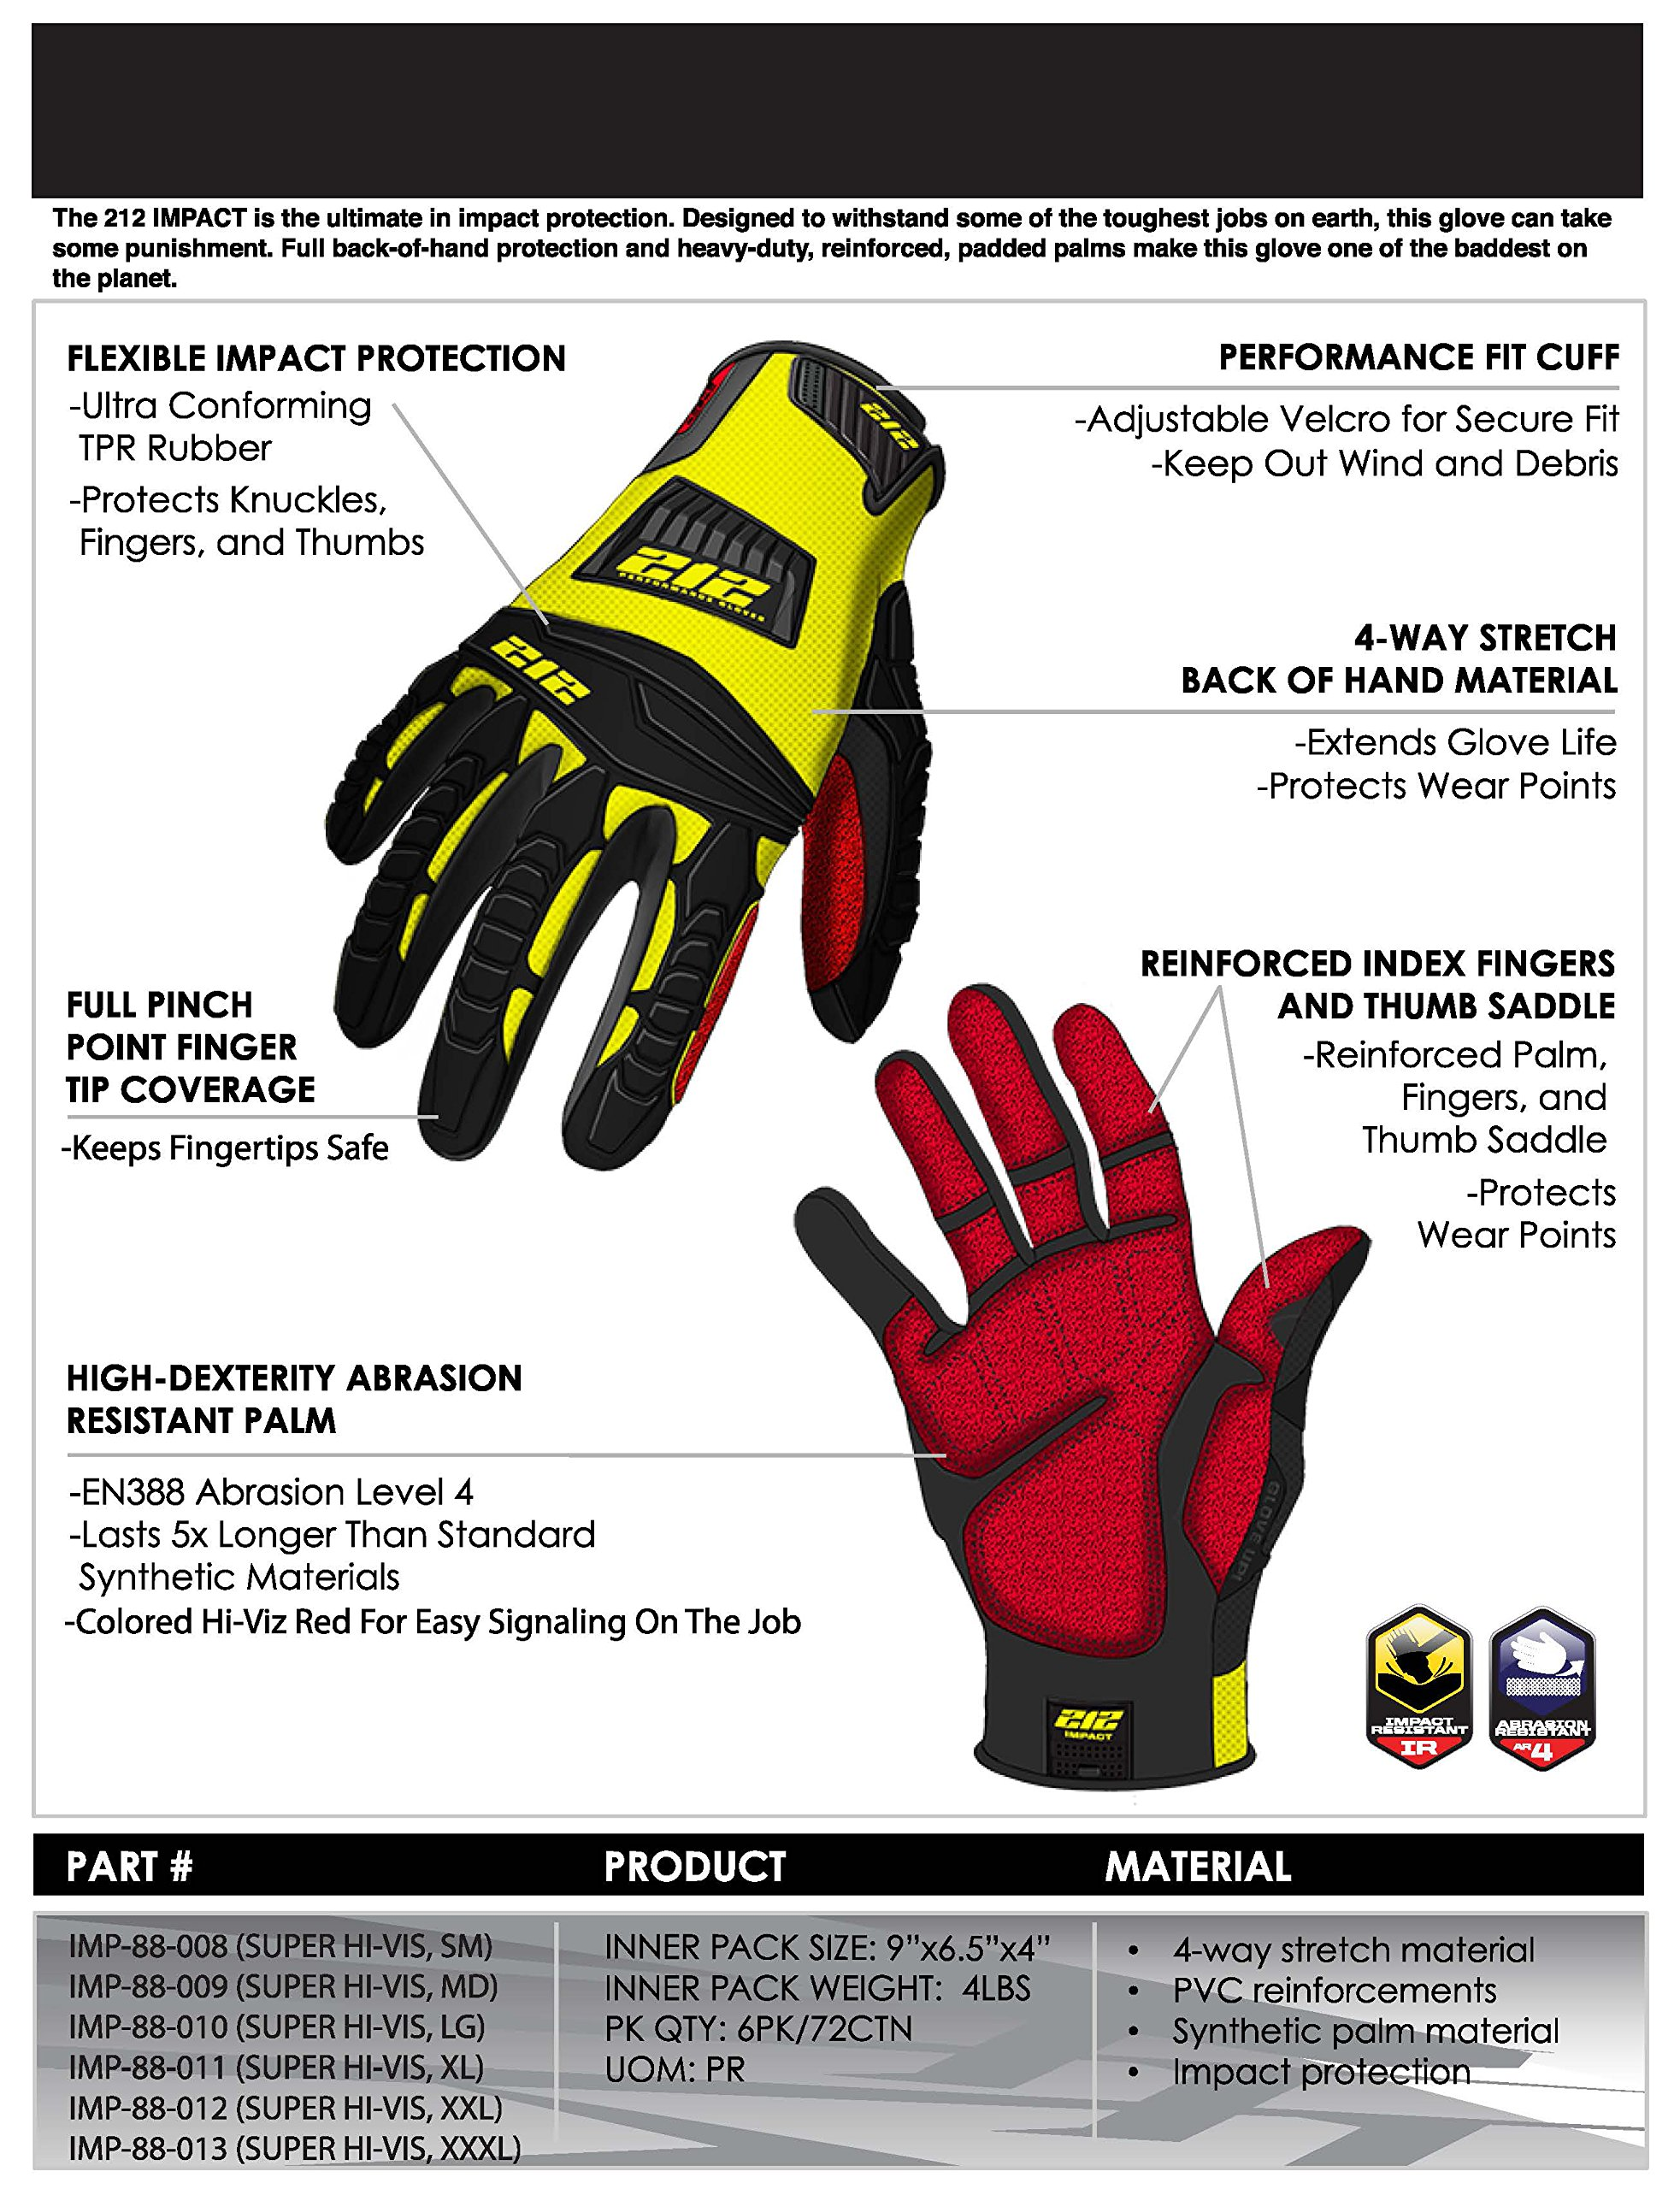 212 Performance Gloves IMP-88-009 Super Hi-Vis Impact Gloves, Medium by 212 Performance Gloves (Image #8)